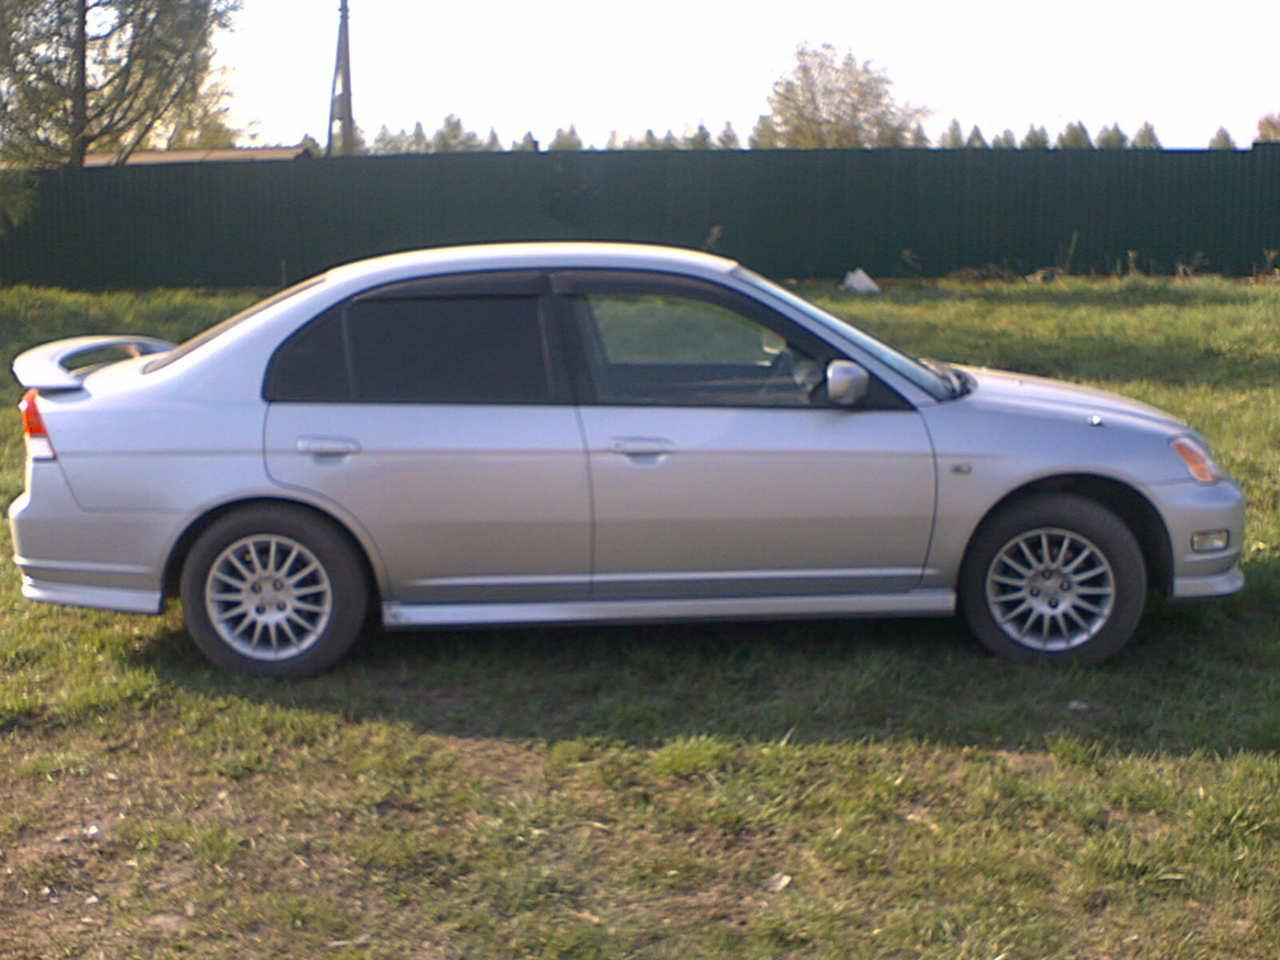 2003 Honda Civic Auto Repair Manual ChiltonDIY